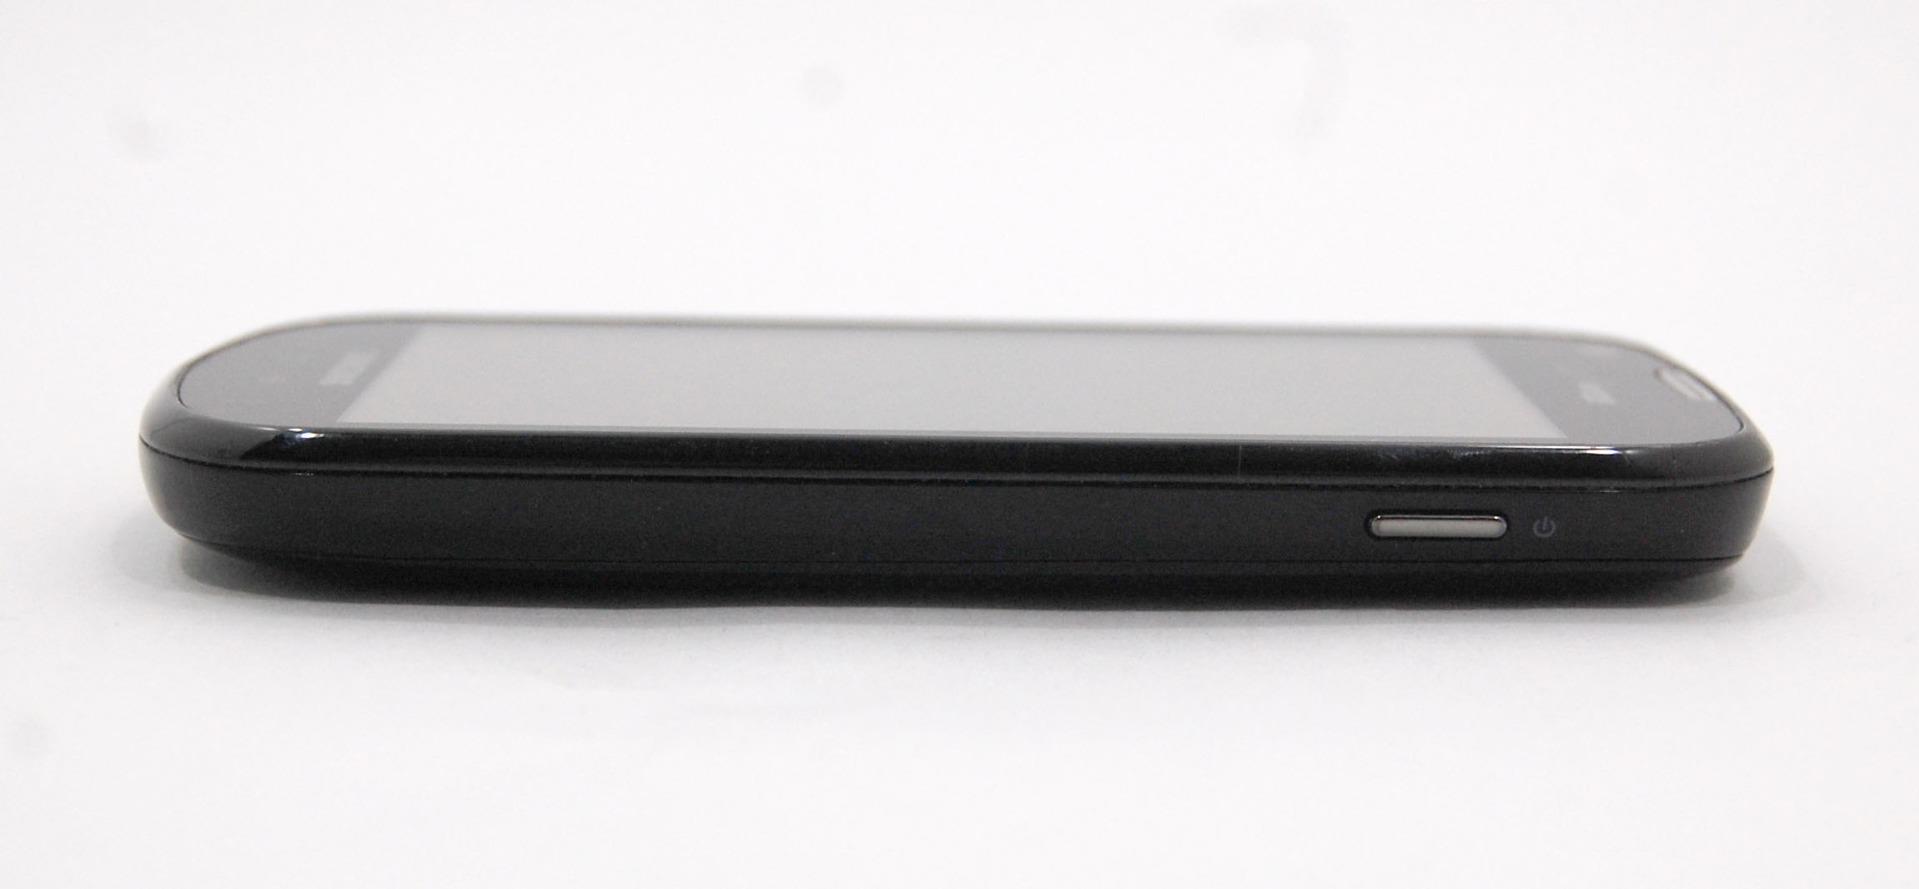 Samsung-Galaxy-Stellar-SCH-I200-4GB-4G-LTE-Android-Black-Smartphone-Verizon thumbnail 3